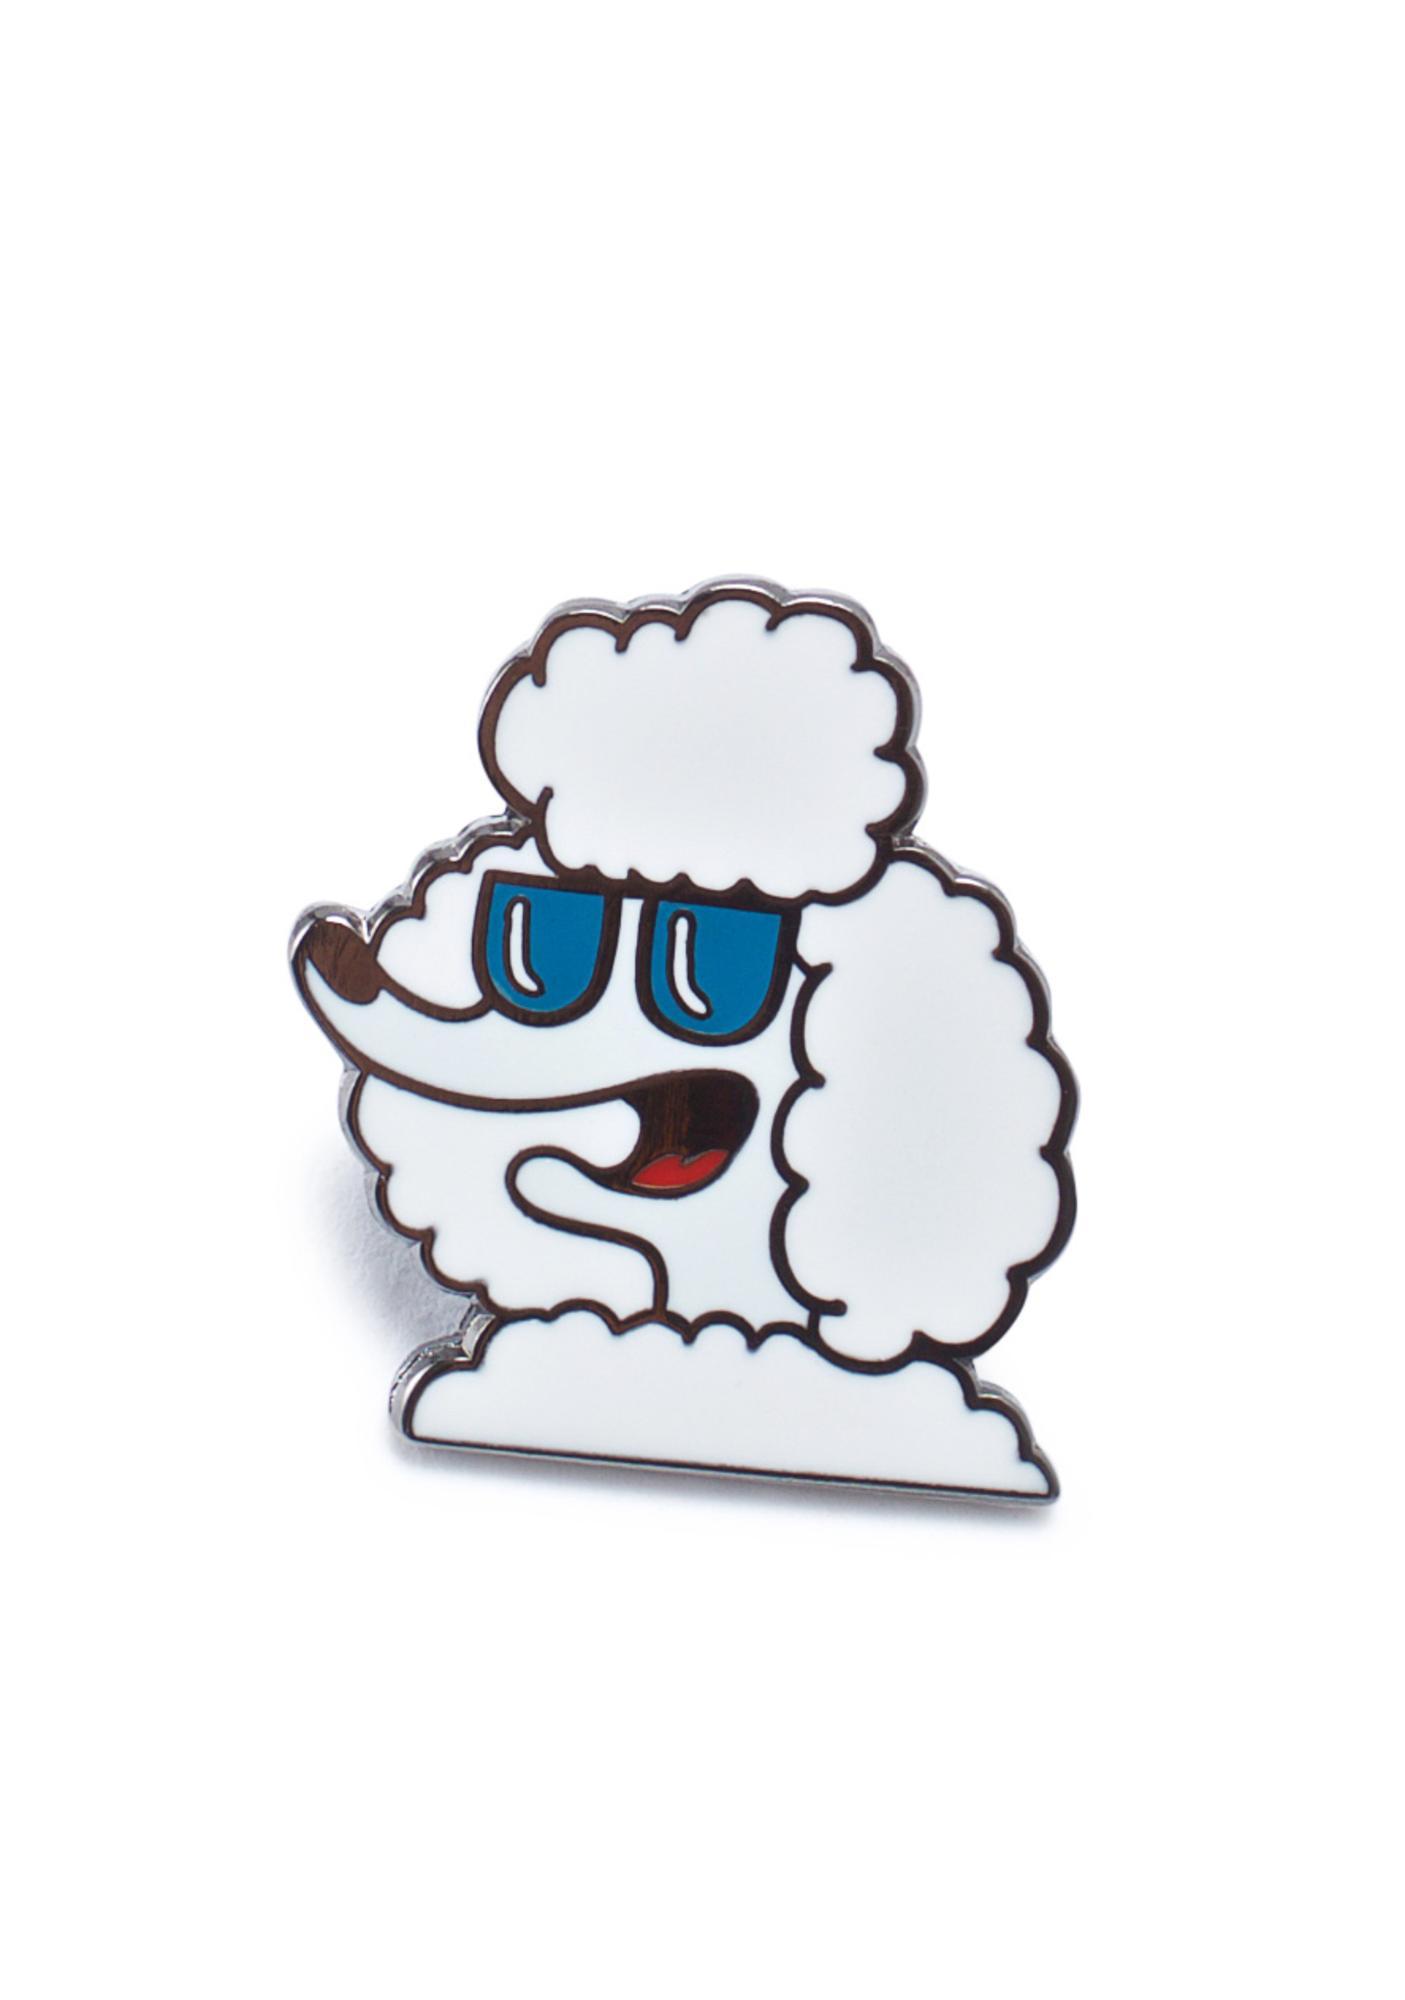 Valley Cruise Press Sickest Dog Alive Enamel Pin